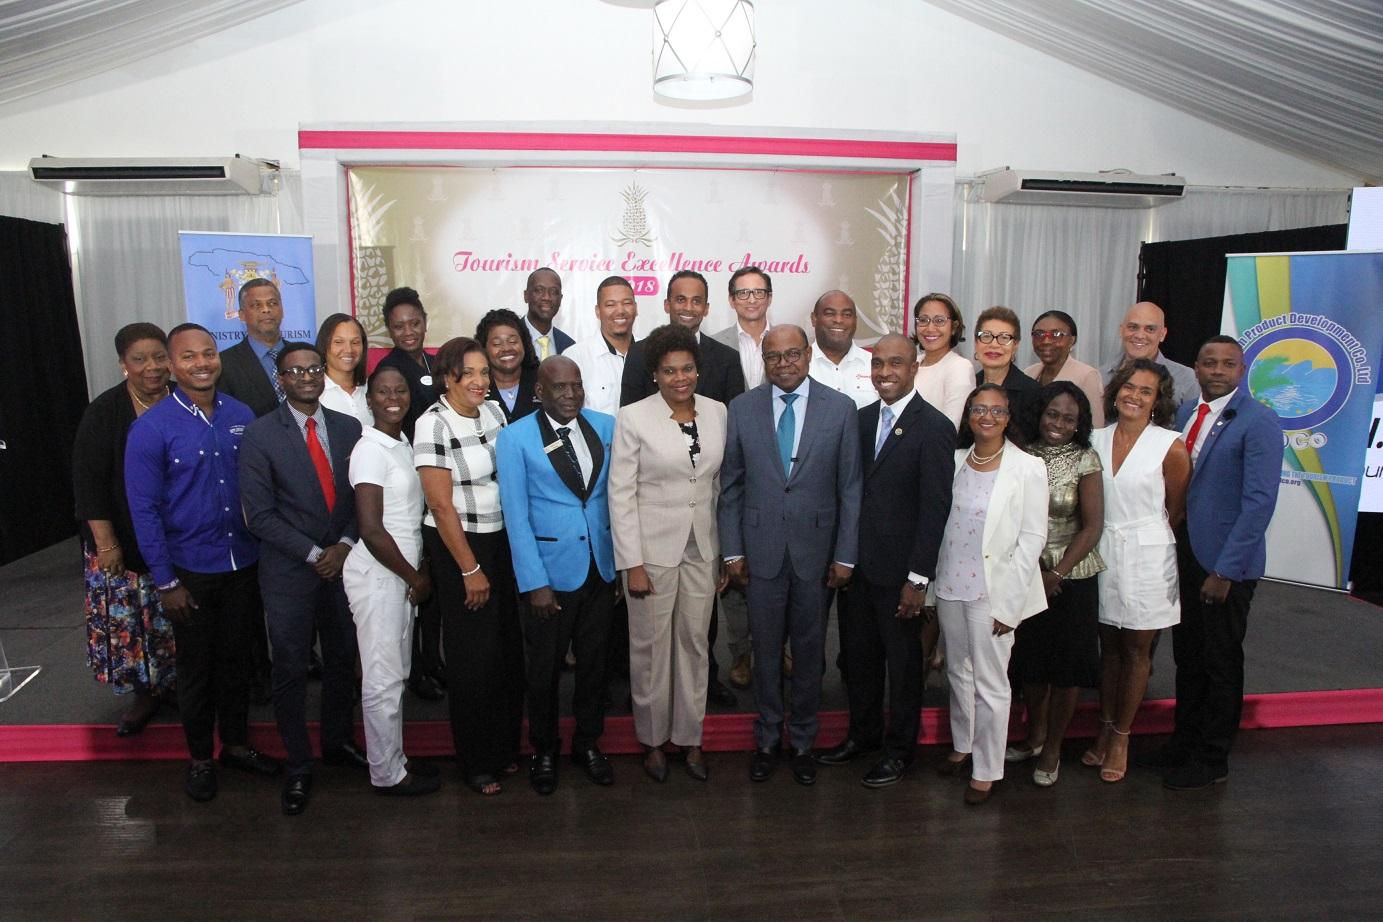 Jamaica Tourism Minister Lauds Tourism Service Excellence Finalists photo